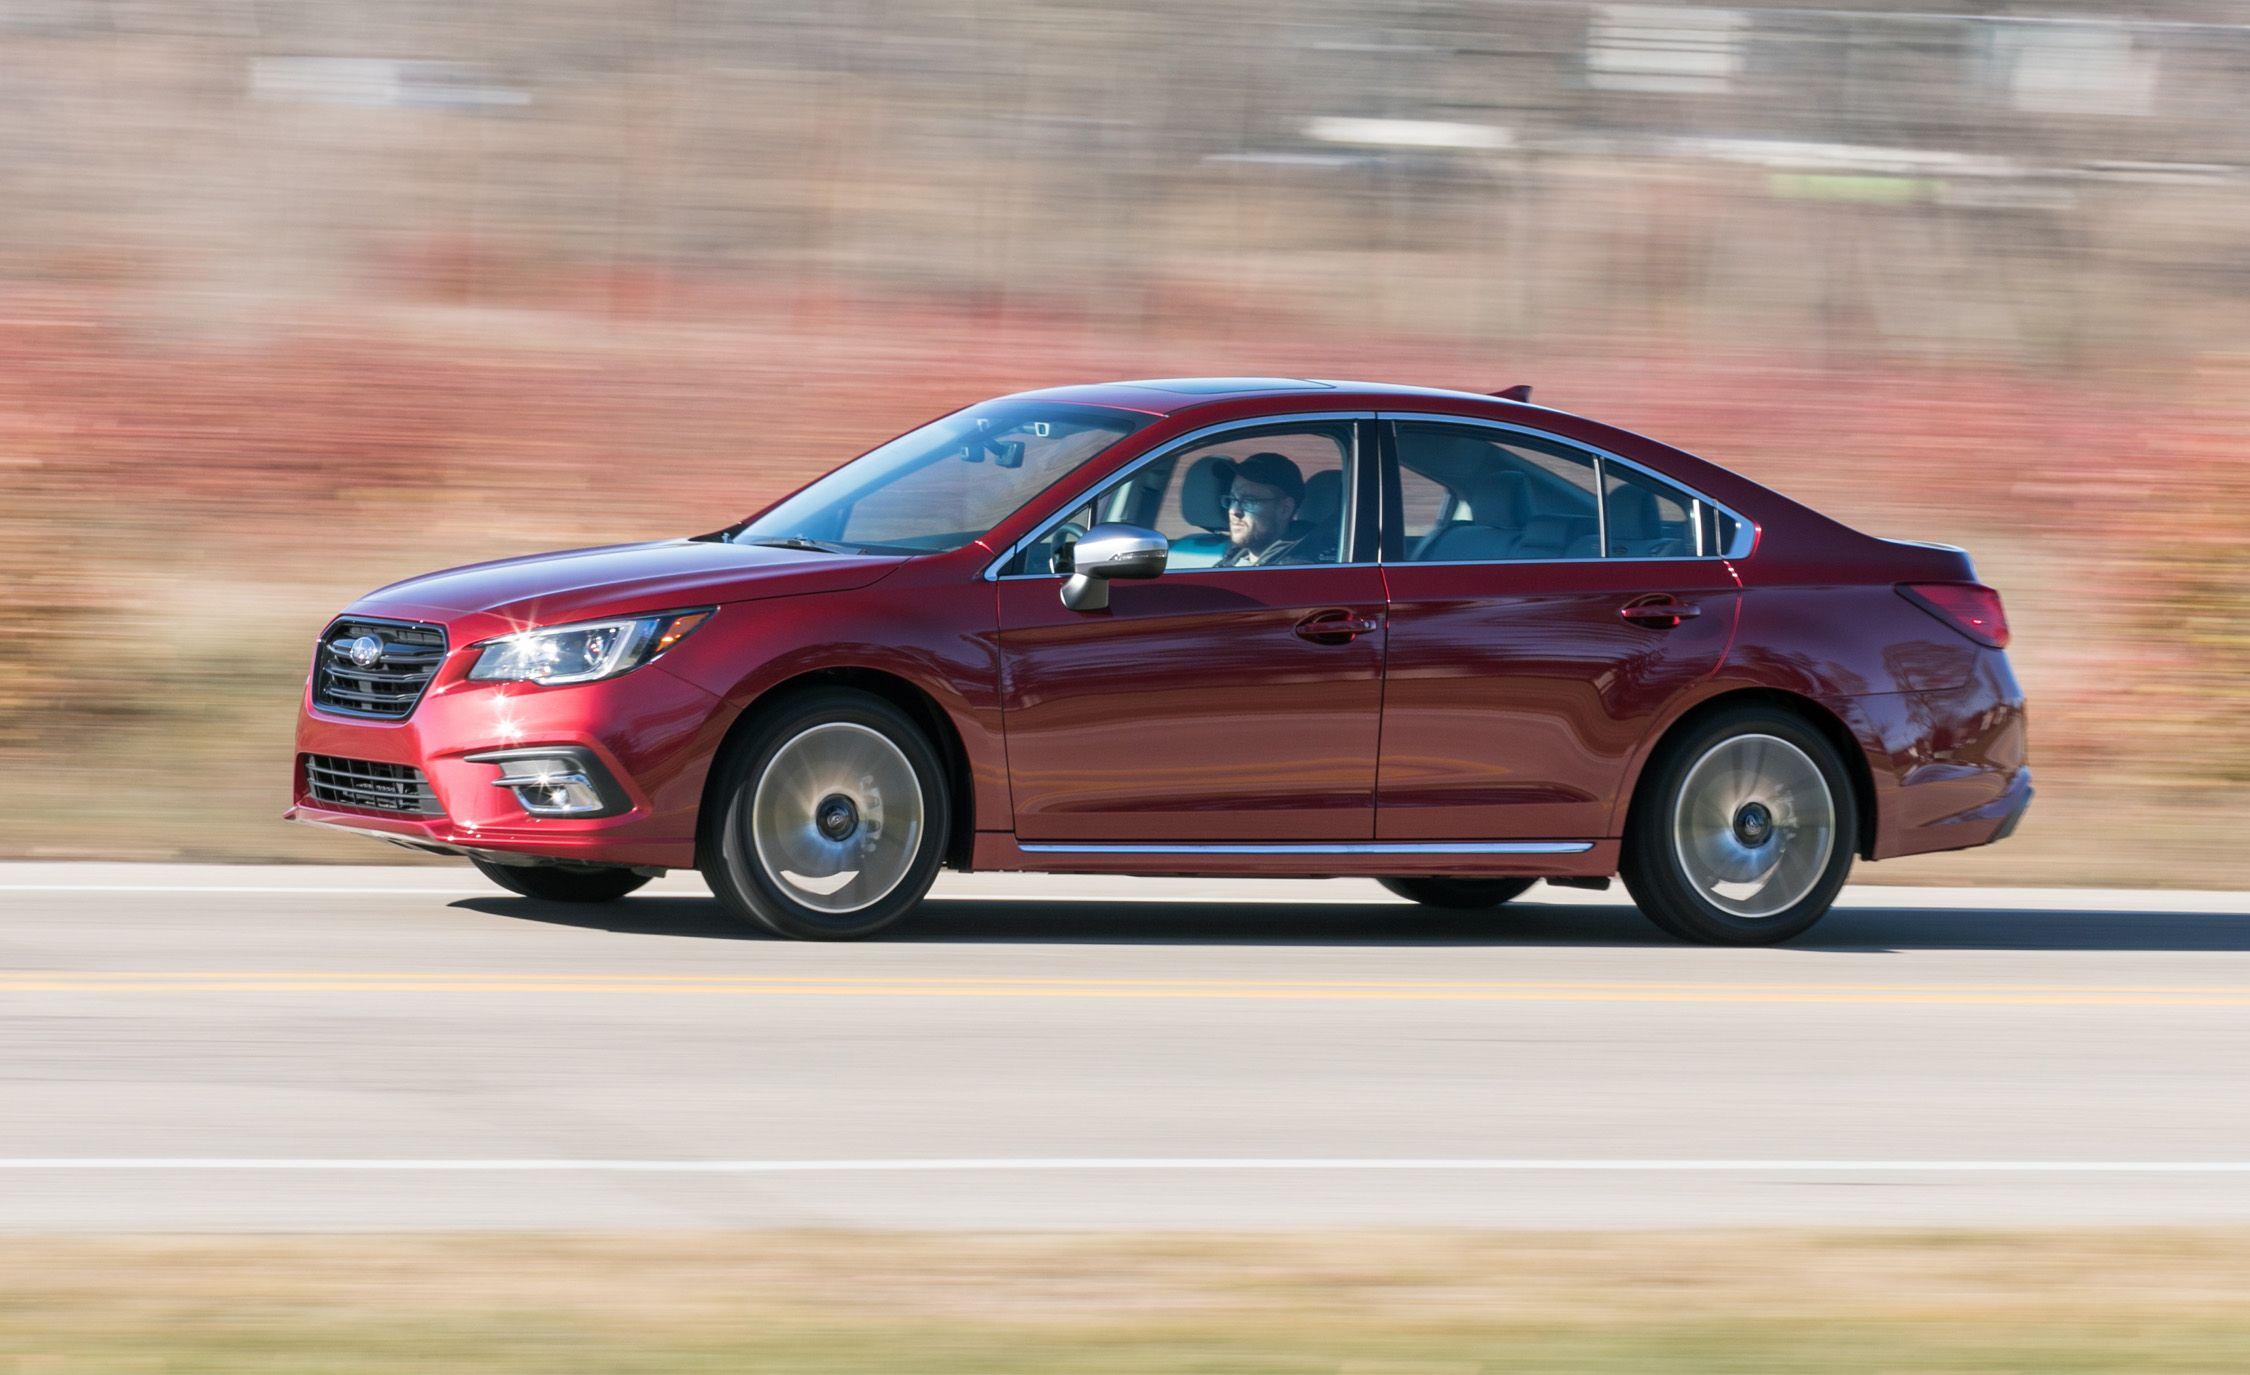 2019 Subaru Legacy Reviews | Subaru Legacy Price, Photos, and Specs | Car  and Driver